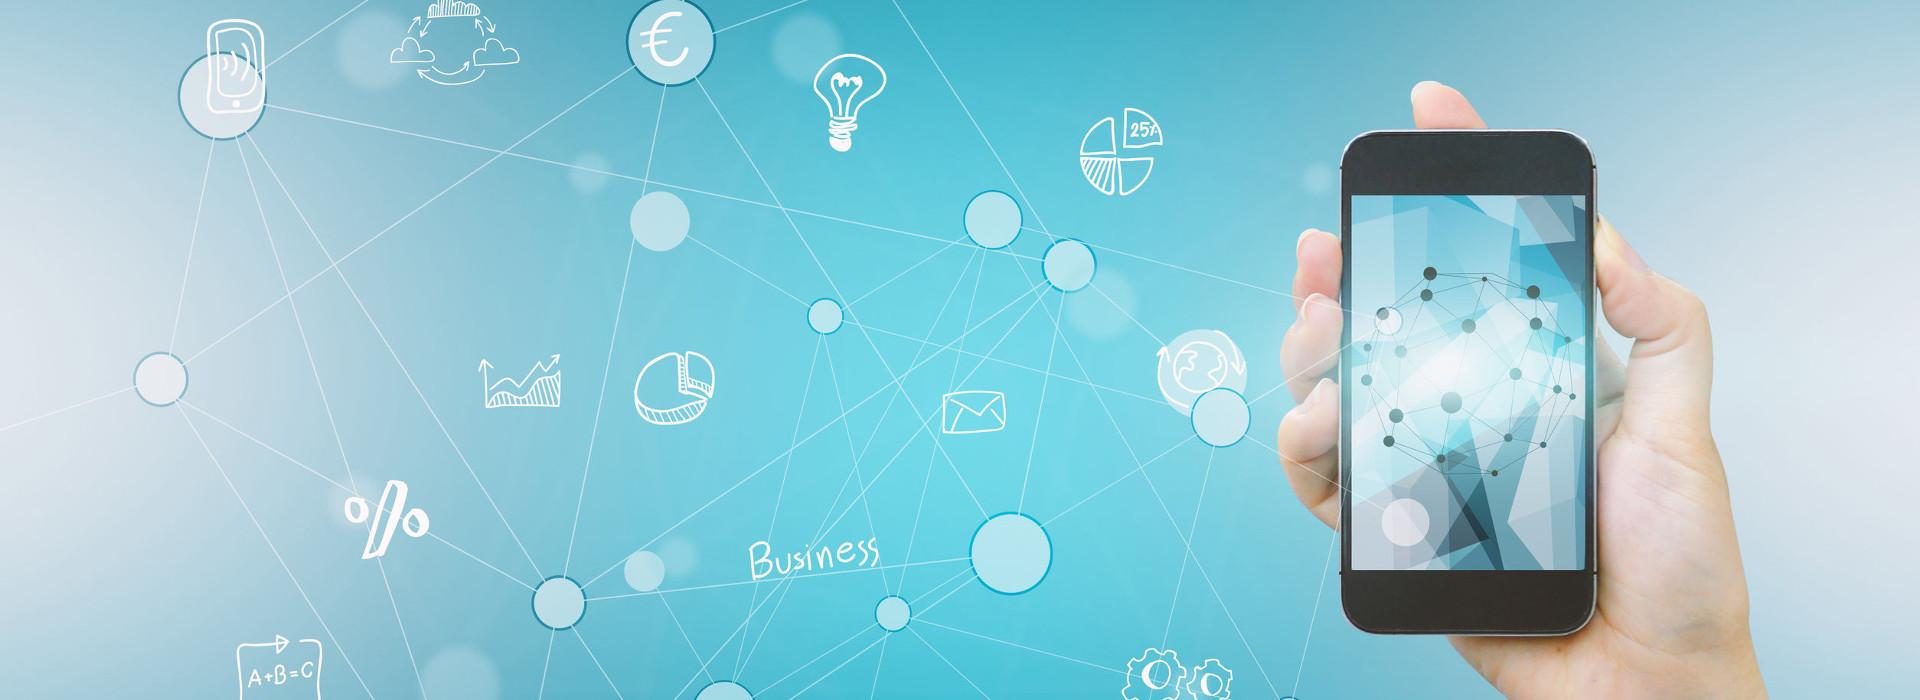 SOCIAL NETWORK – COMUNICAZIONE ONLINE